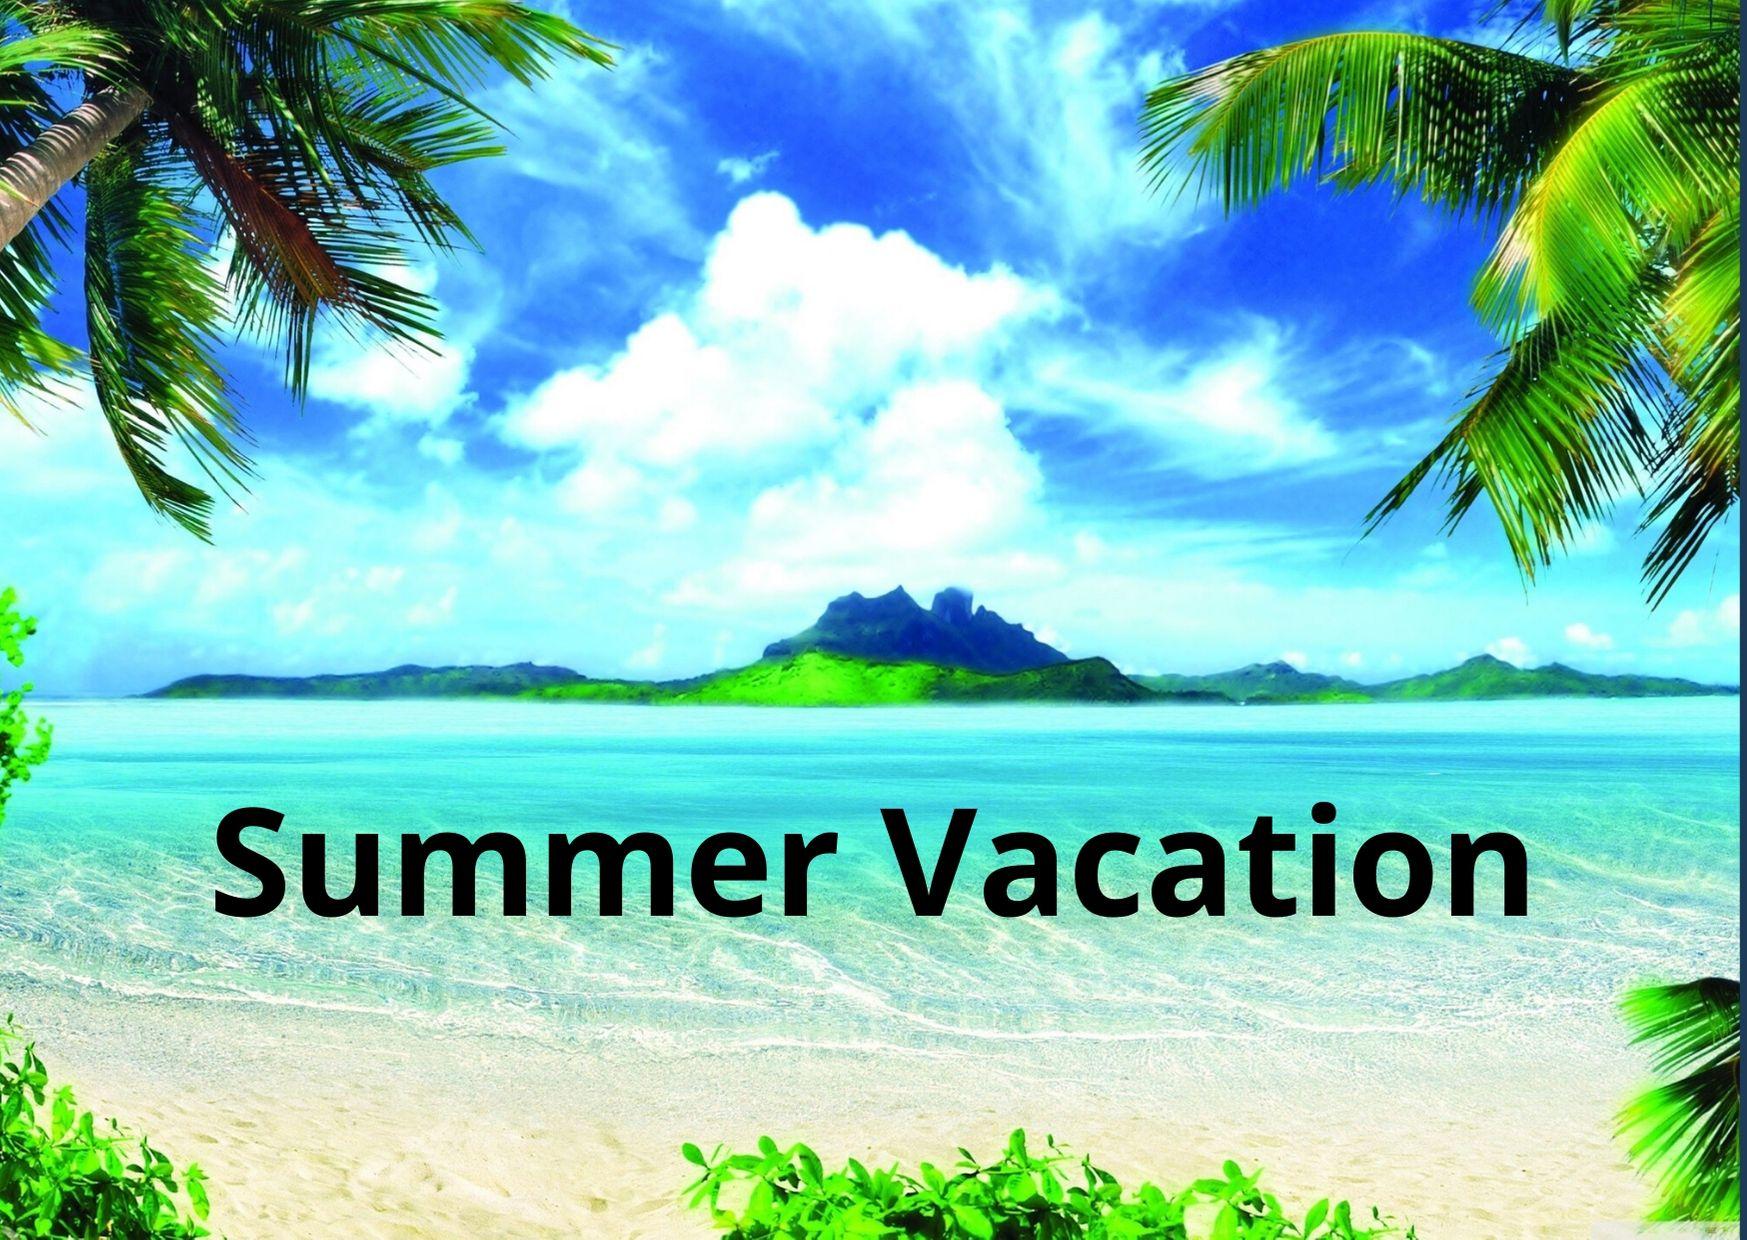 Summer vacation essay for kids